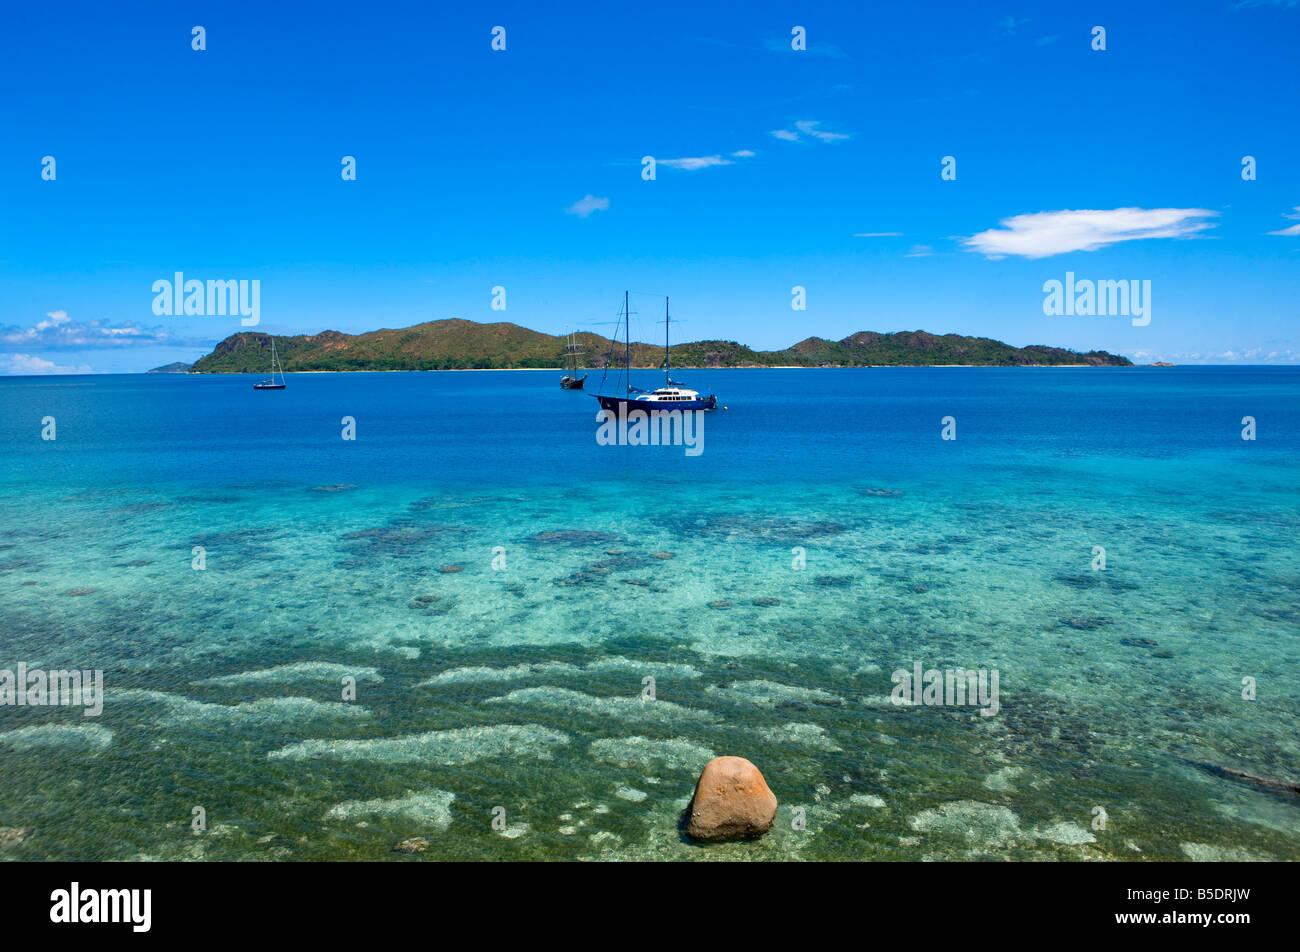 Ile Curieuse Seychelles - Stock Image